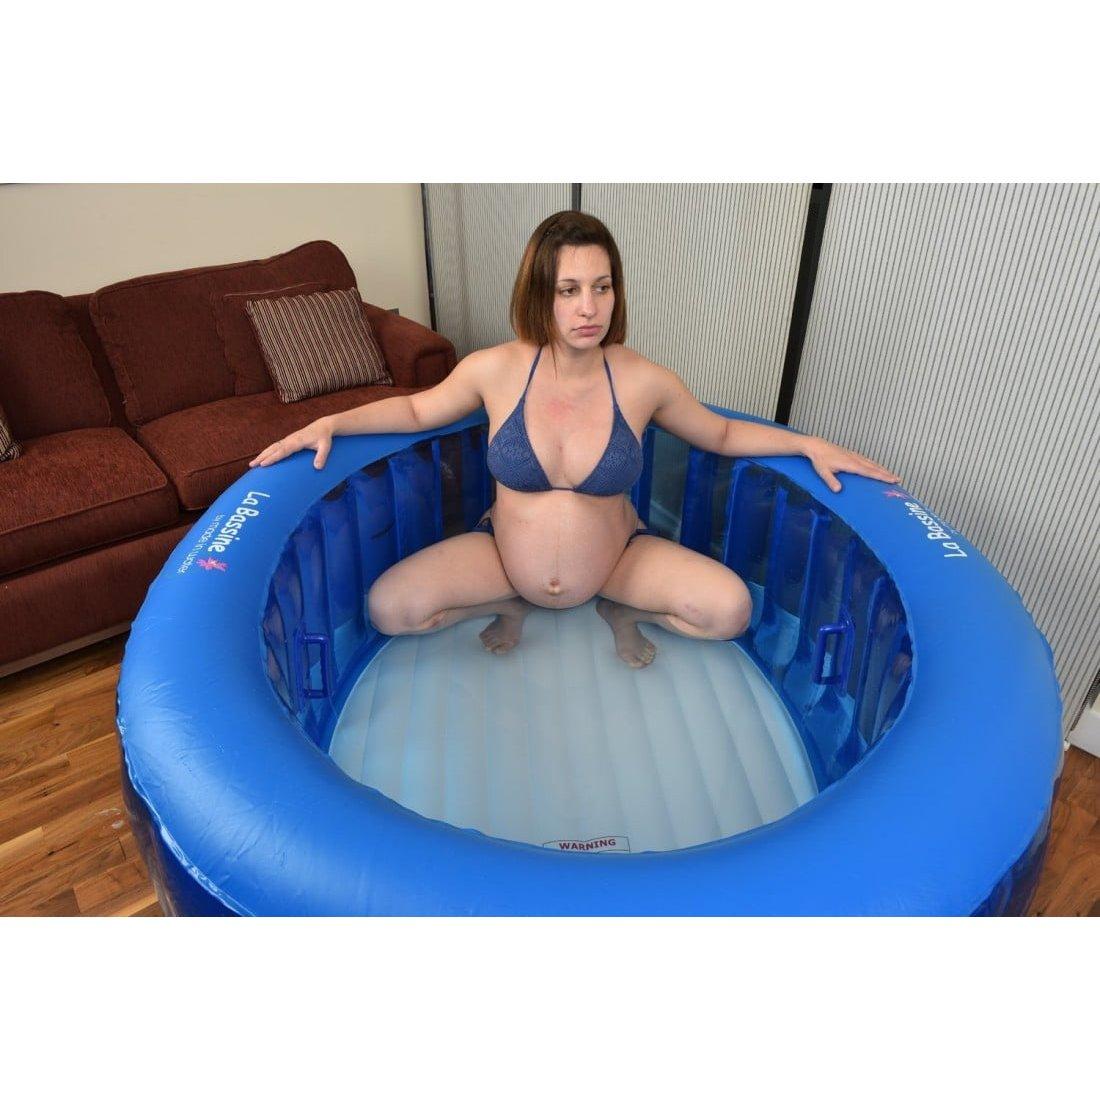 La Bassine Home Birthing Pool